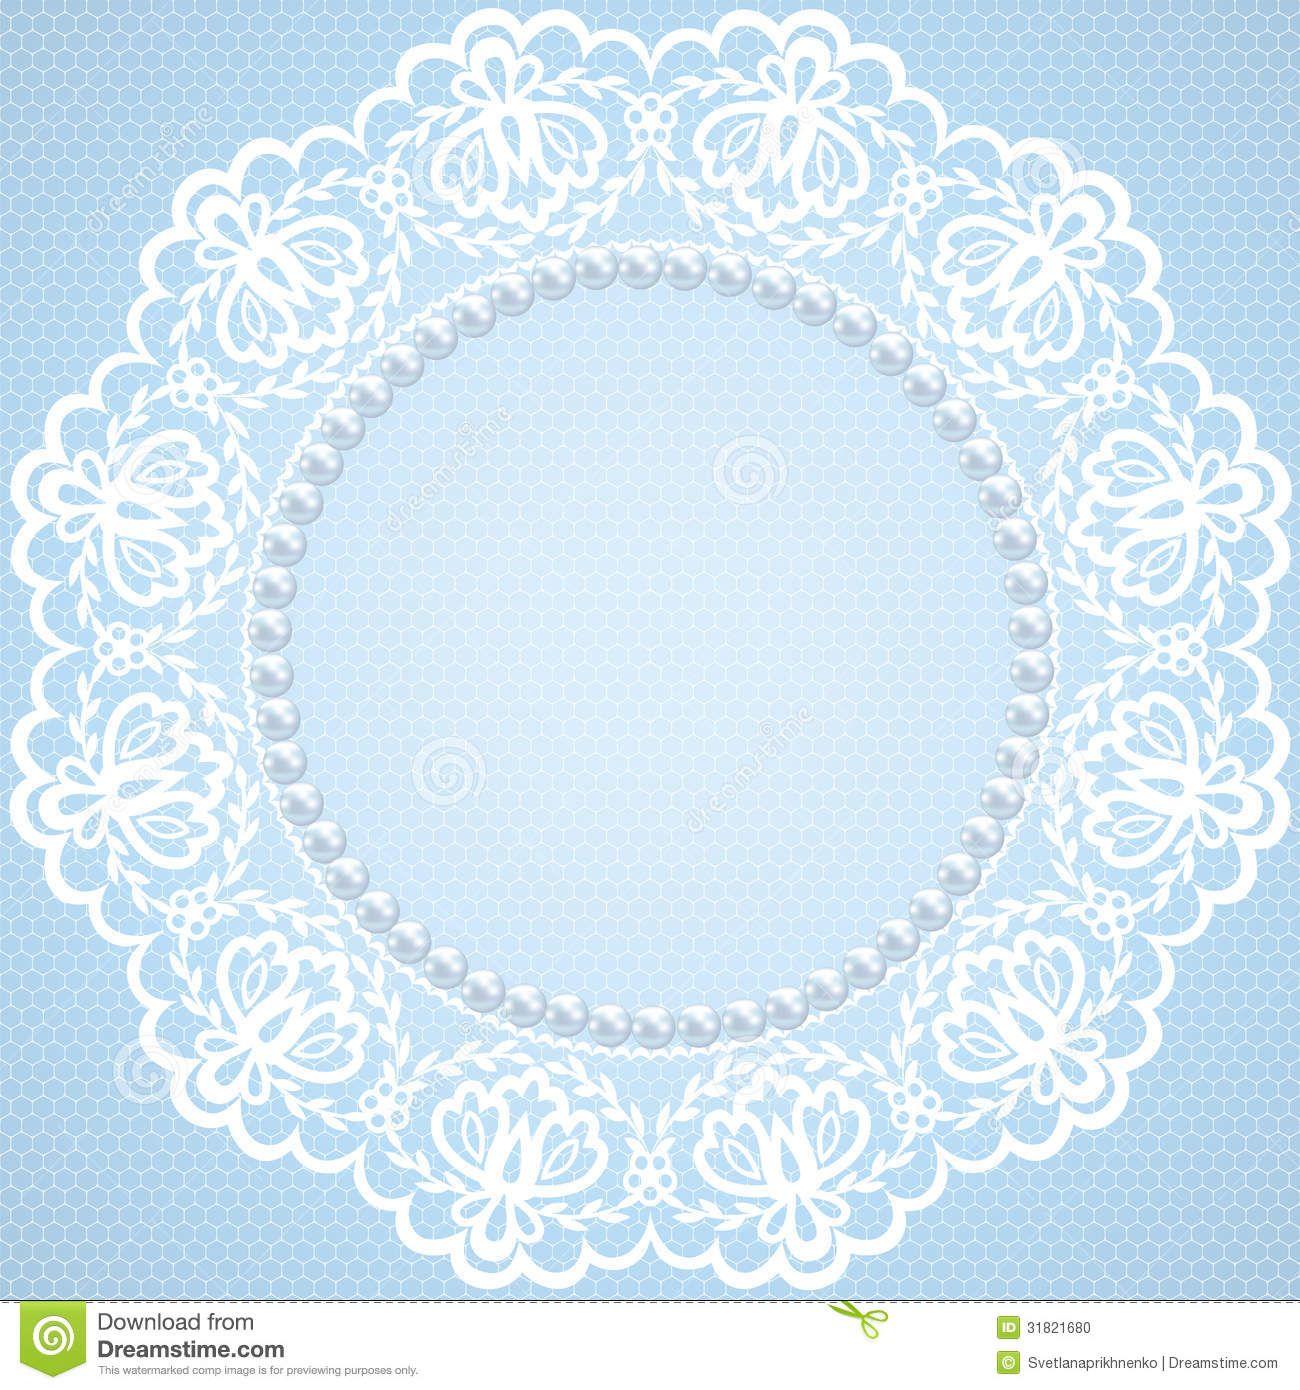 templates lace - Buscar con Google | Printables | Pinterest ...